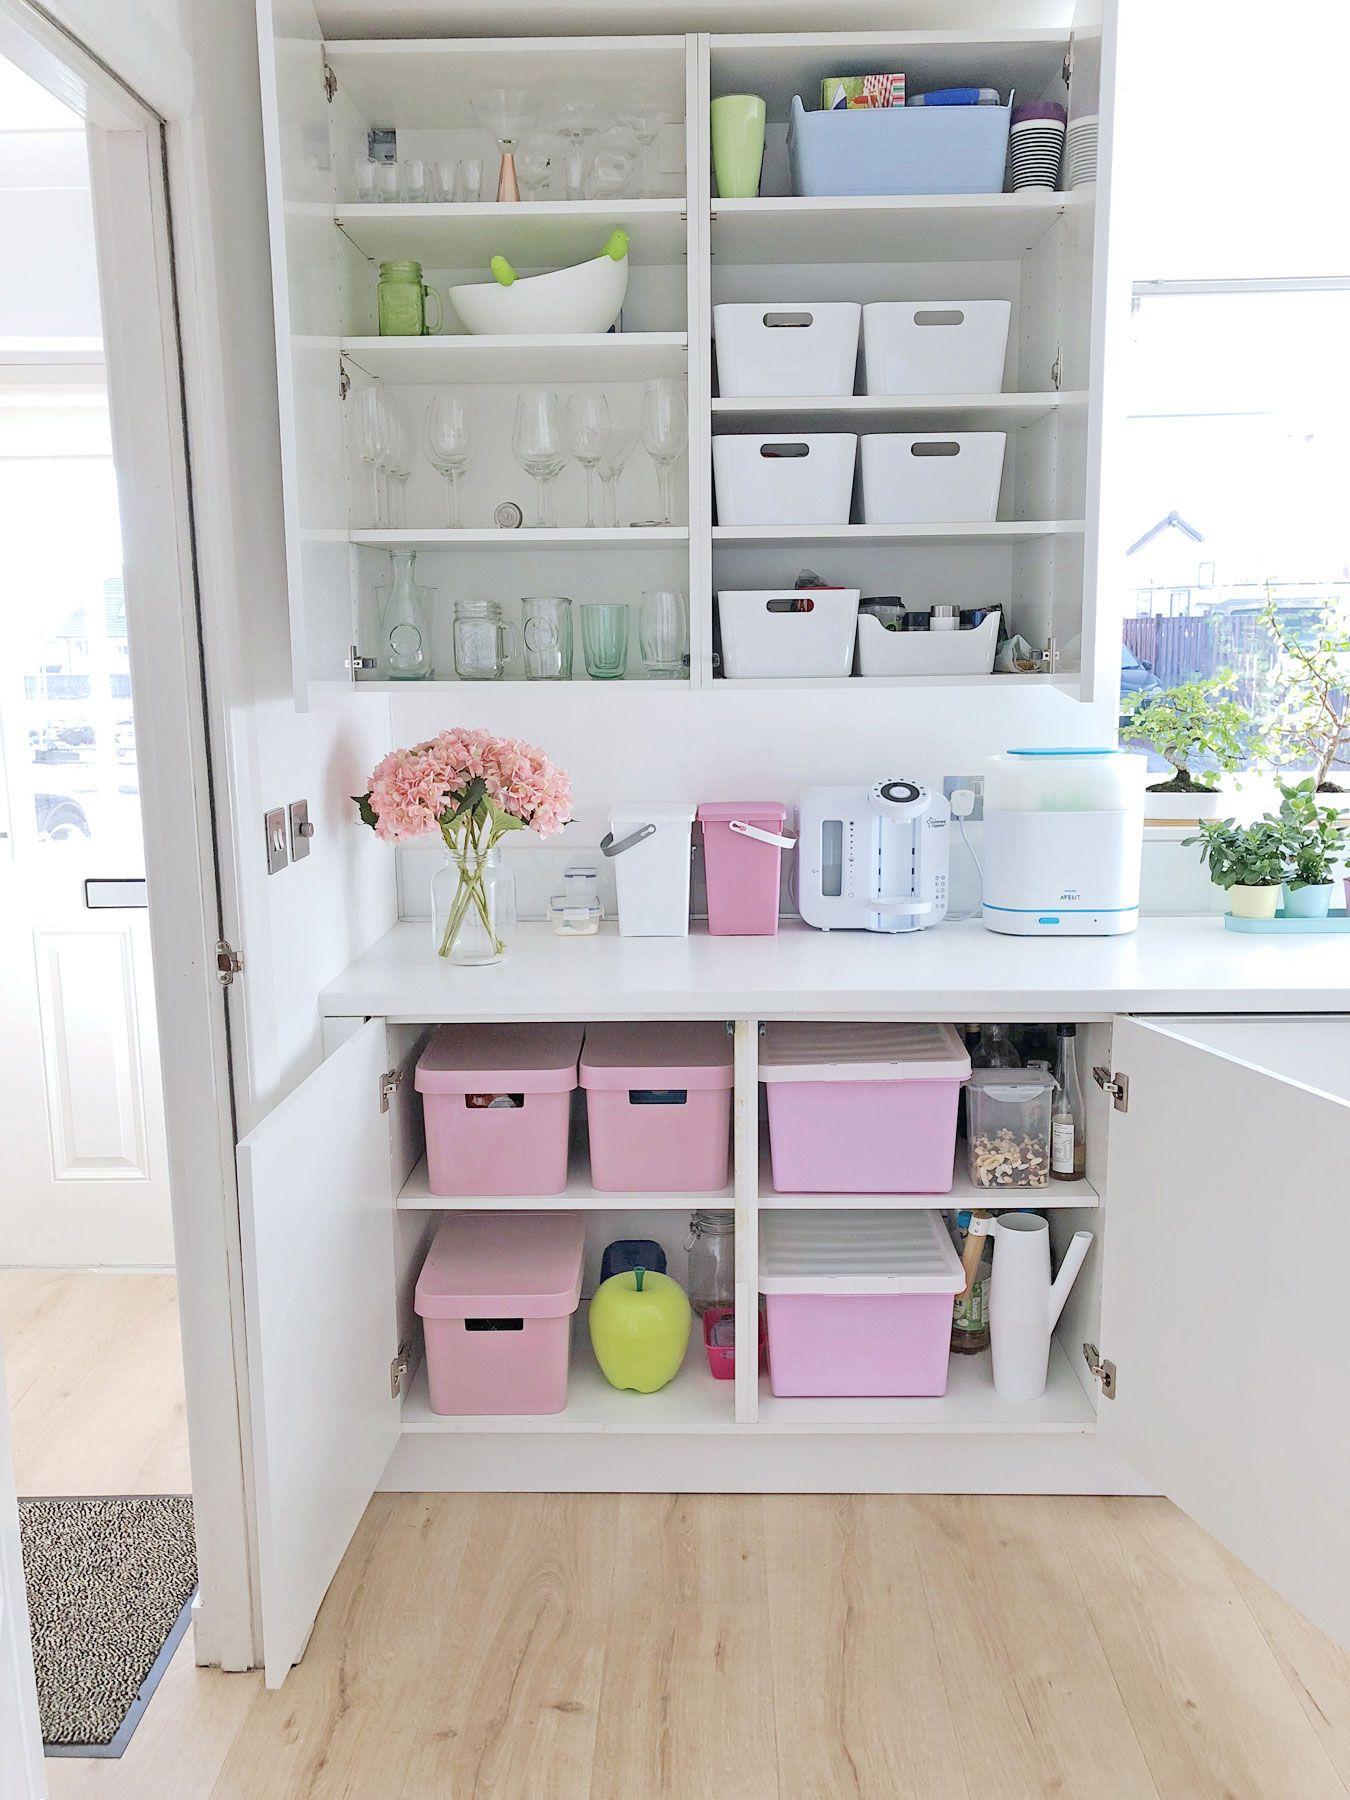 Kitchen Organisation Ideas How To Organise Your Kitchen Kitchen Organisation Kitchen Cupboard Organization Kitchen Storage Boxes